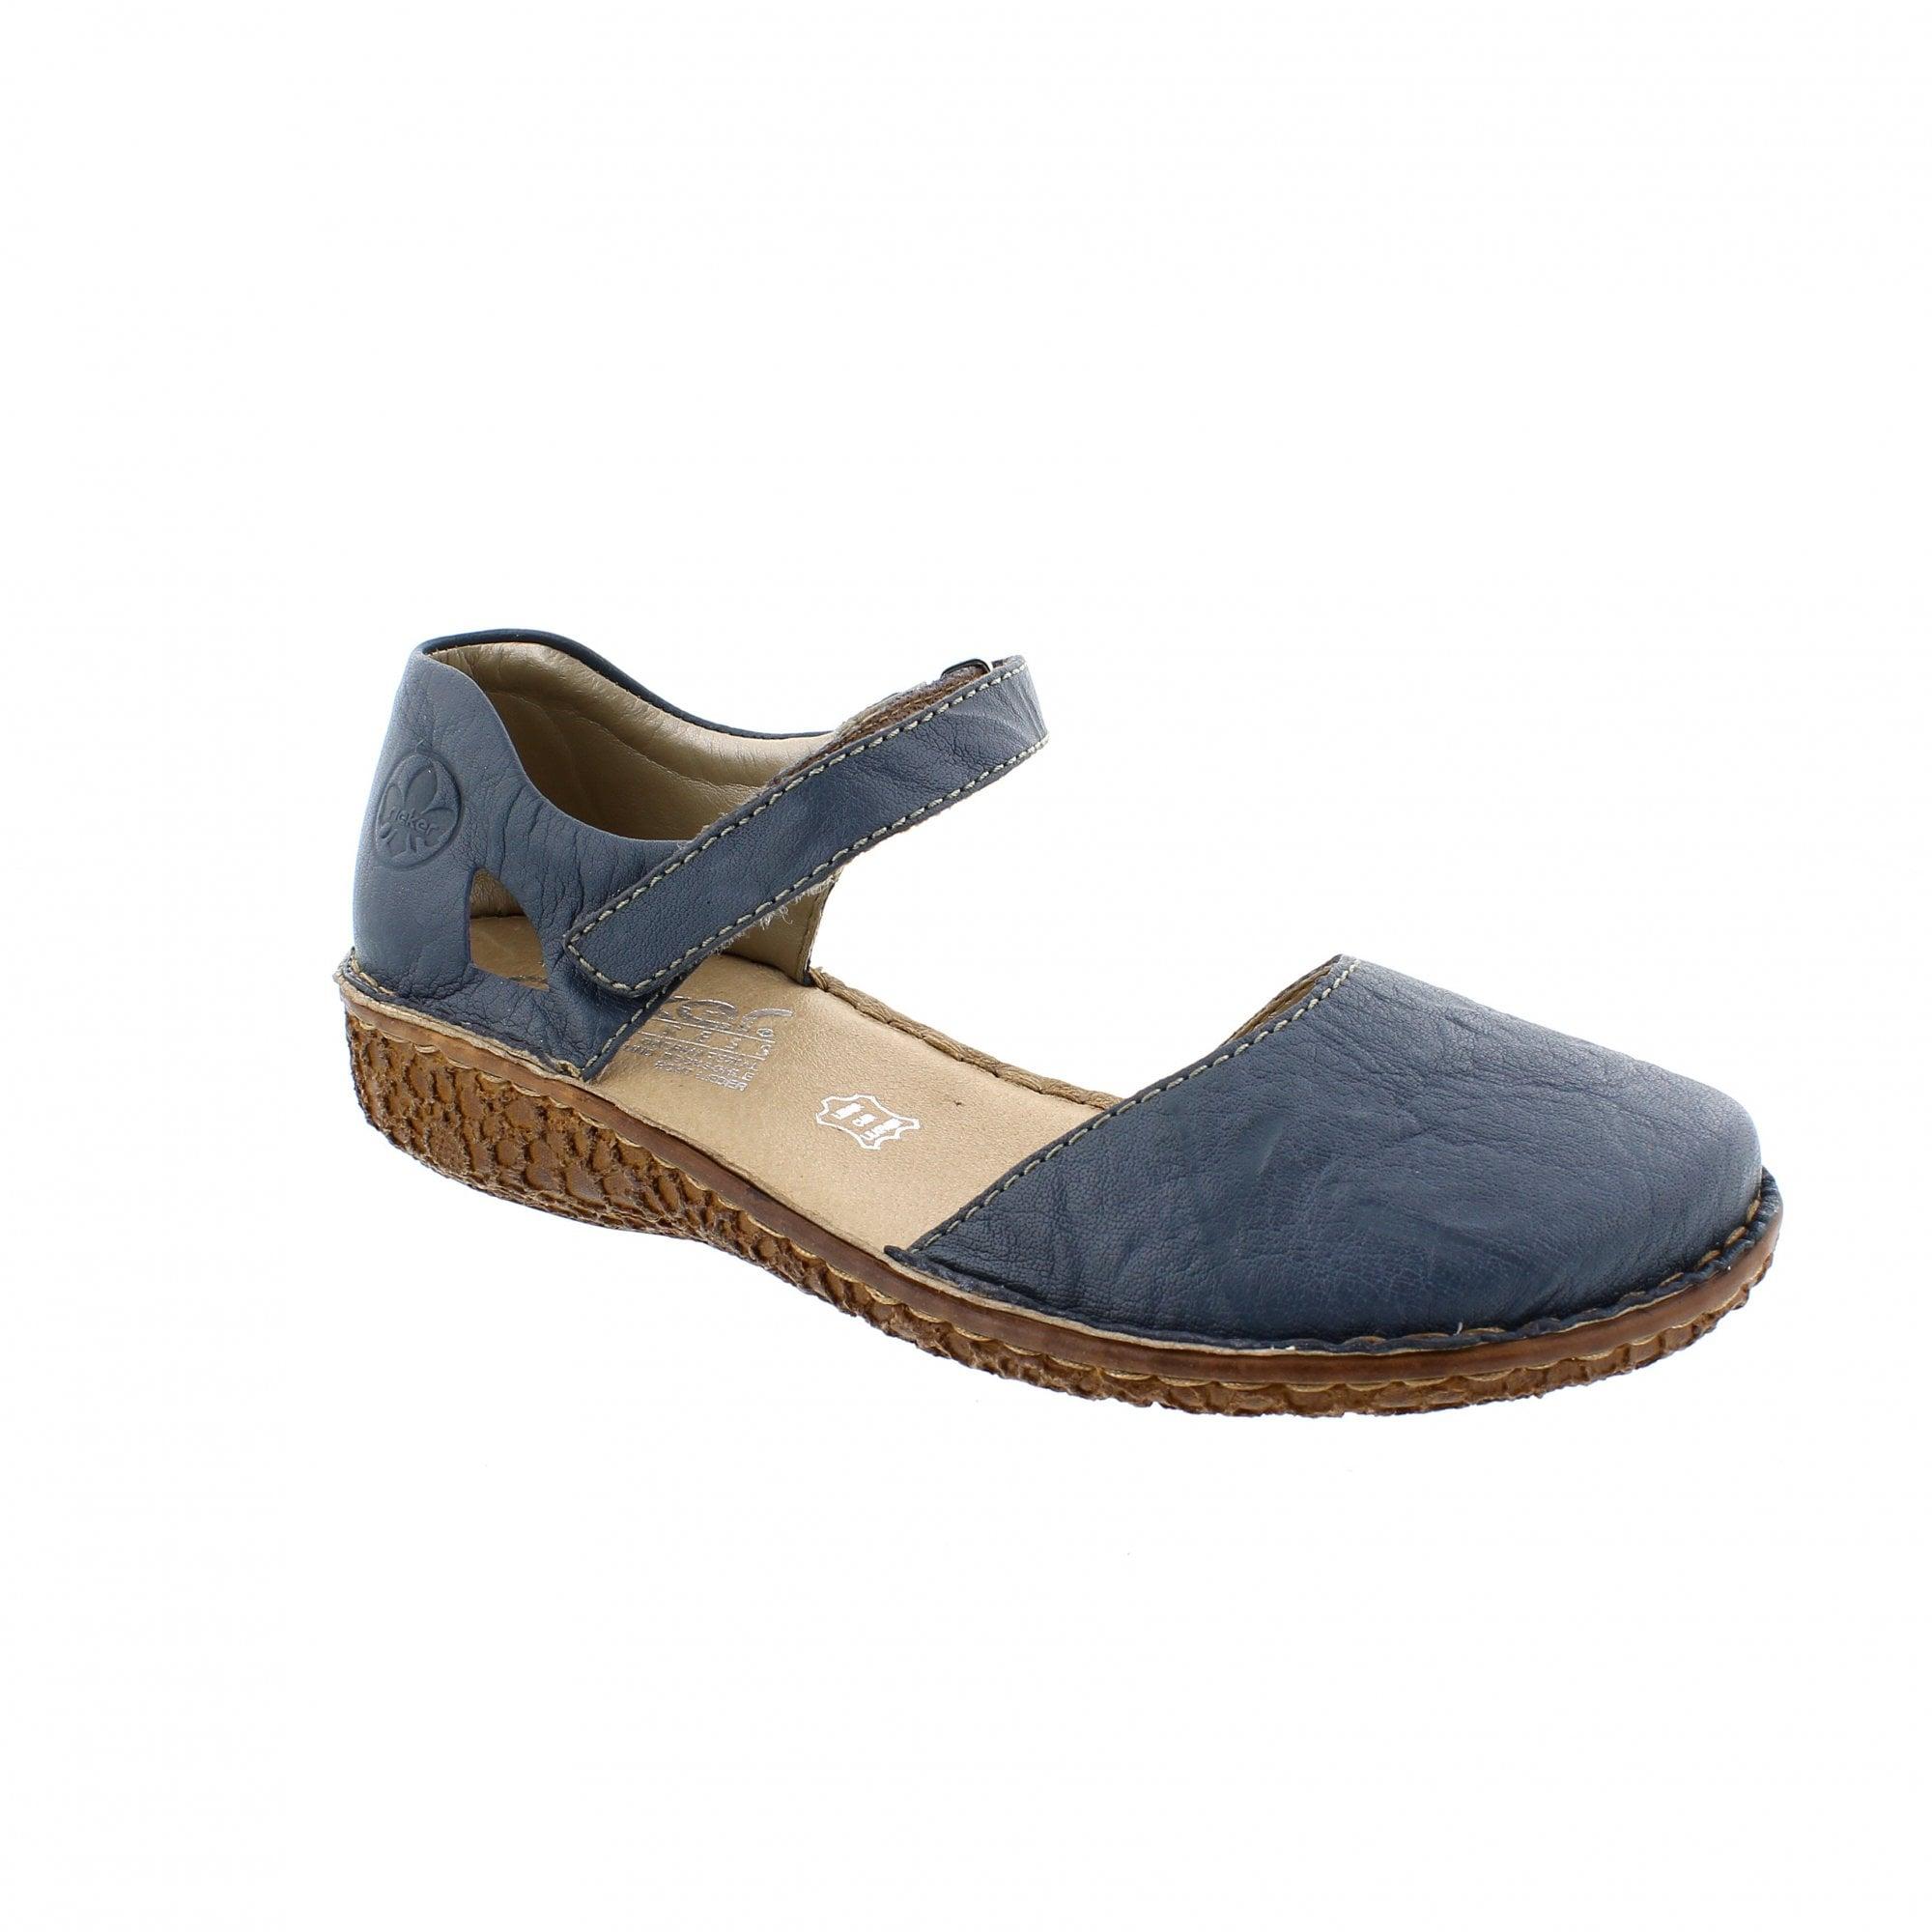 c5613cea74 Rieker M0969-13 Denim Leather Womens Mary Jane Bar Shoes